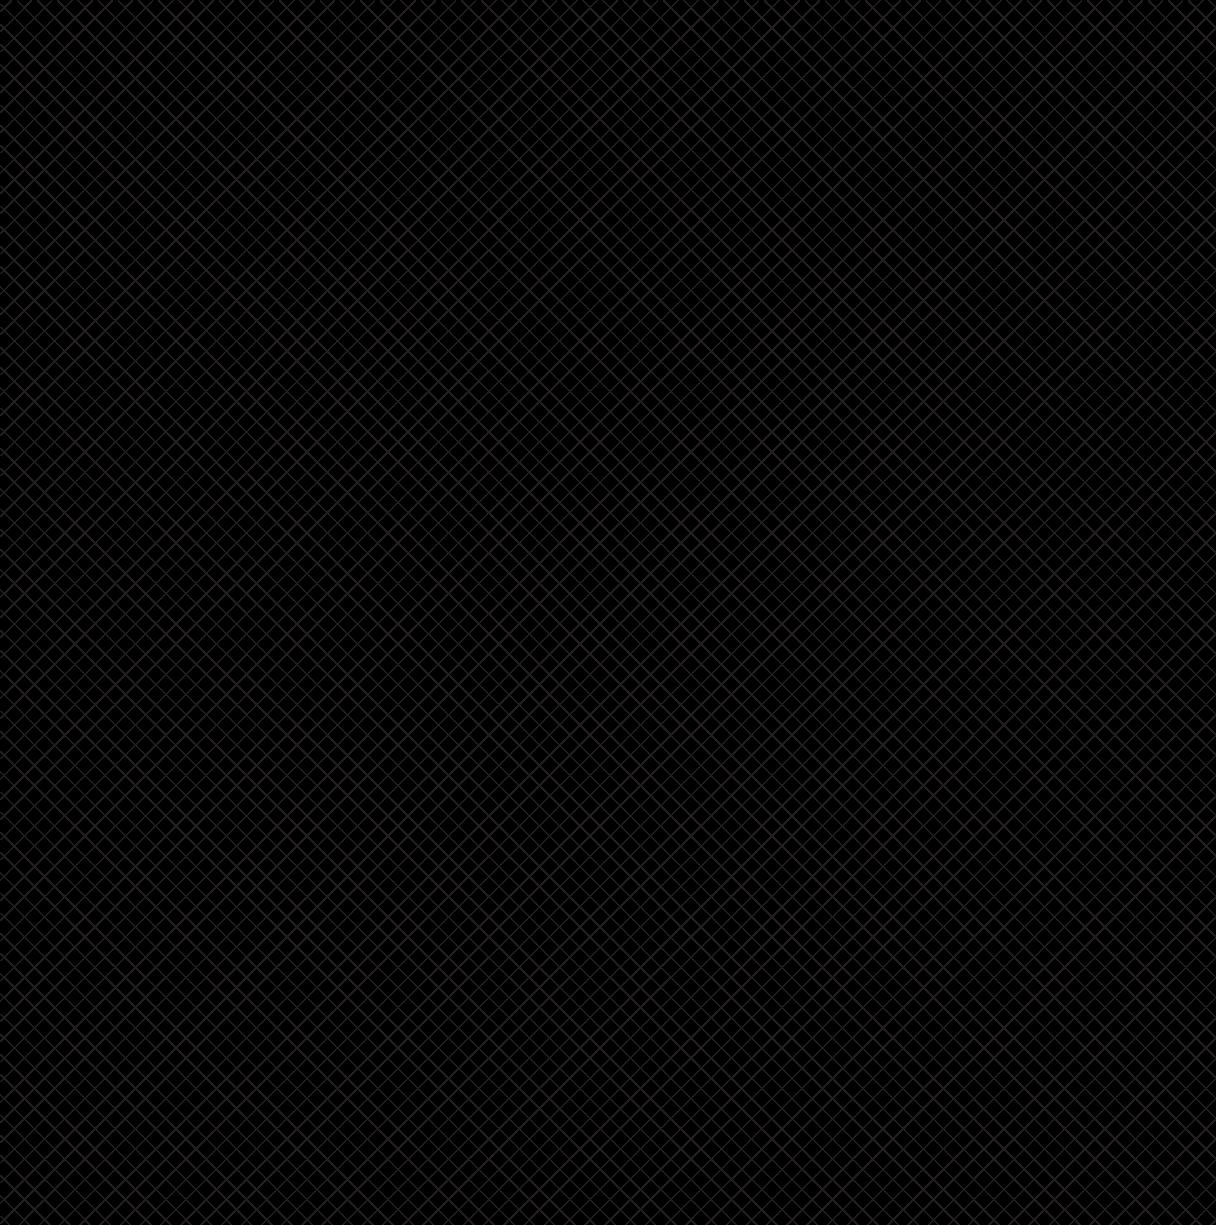 Dyno Grid Png image #43568